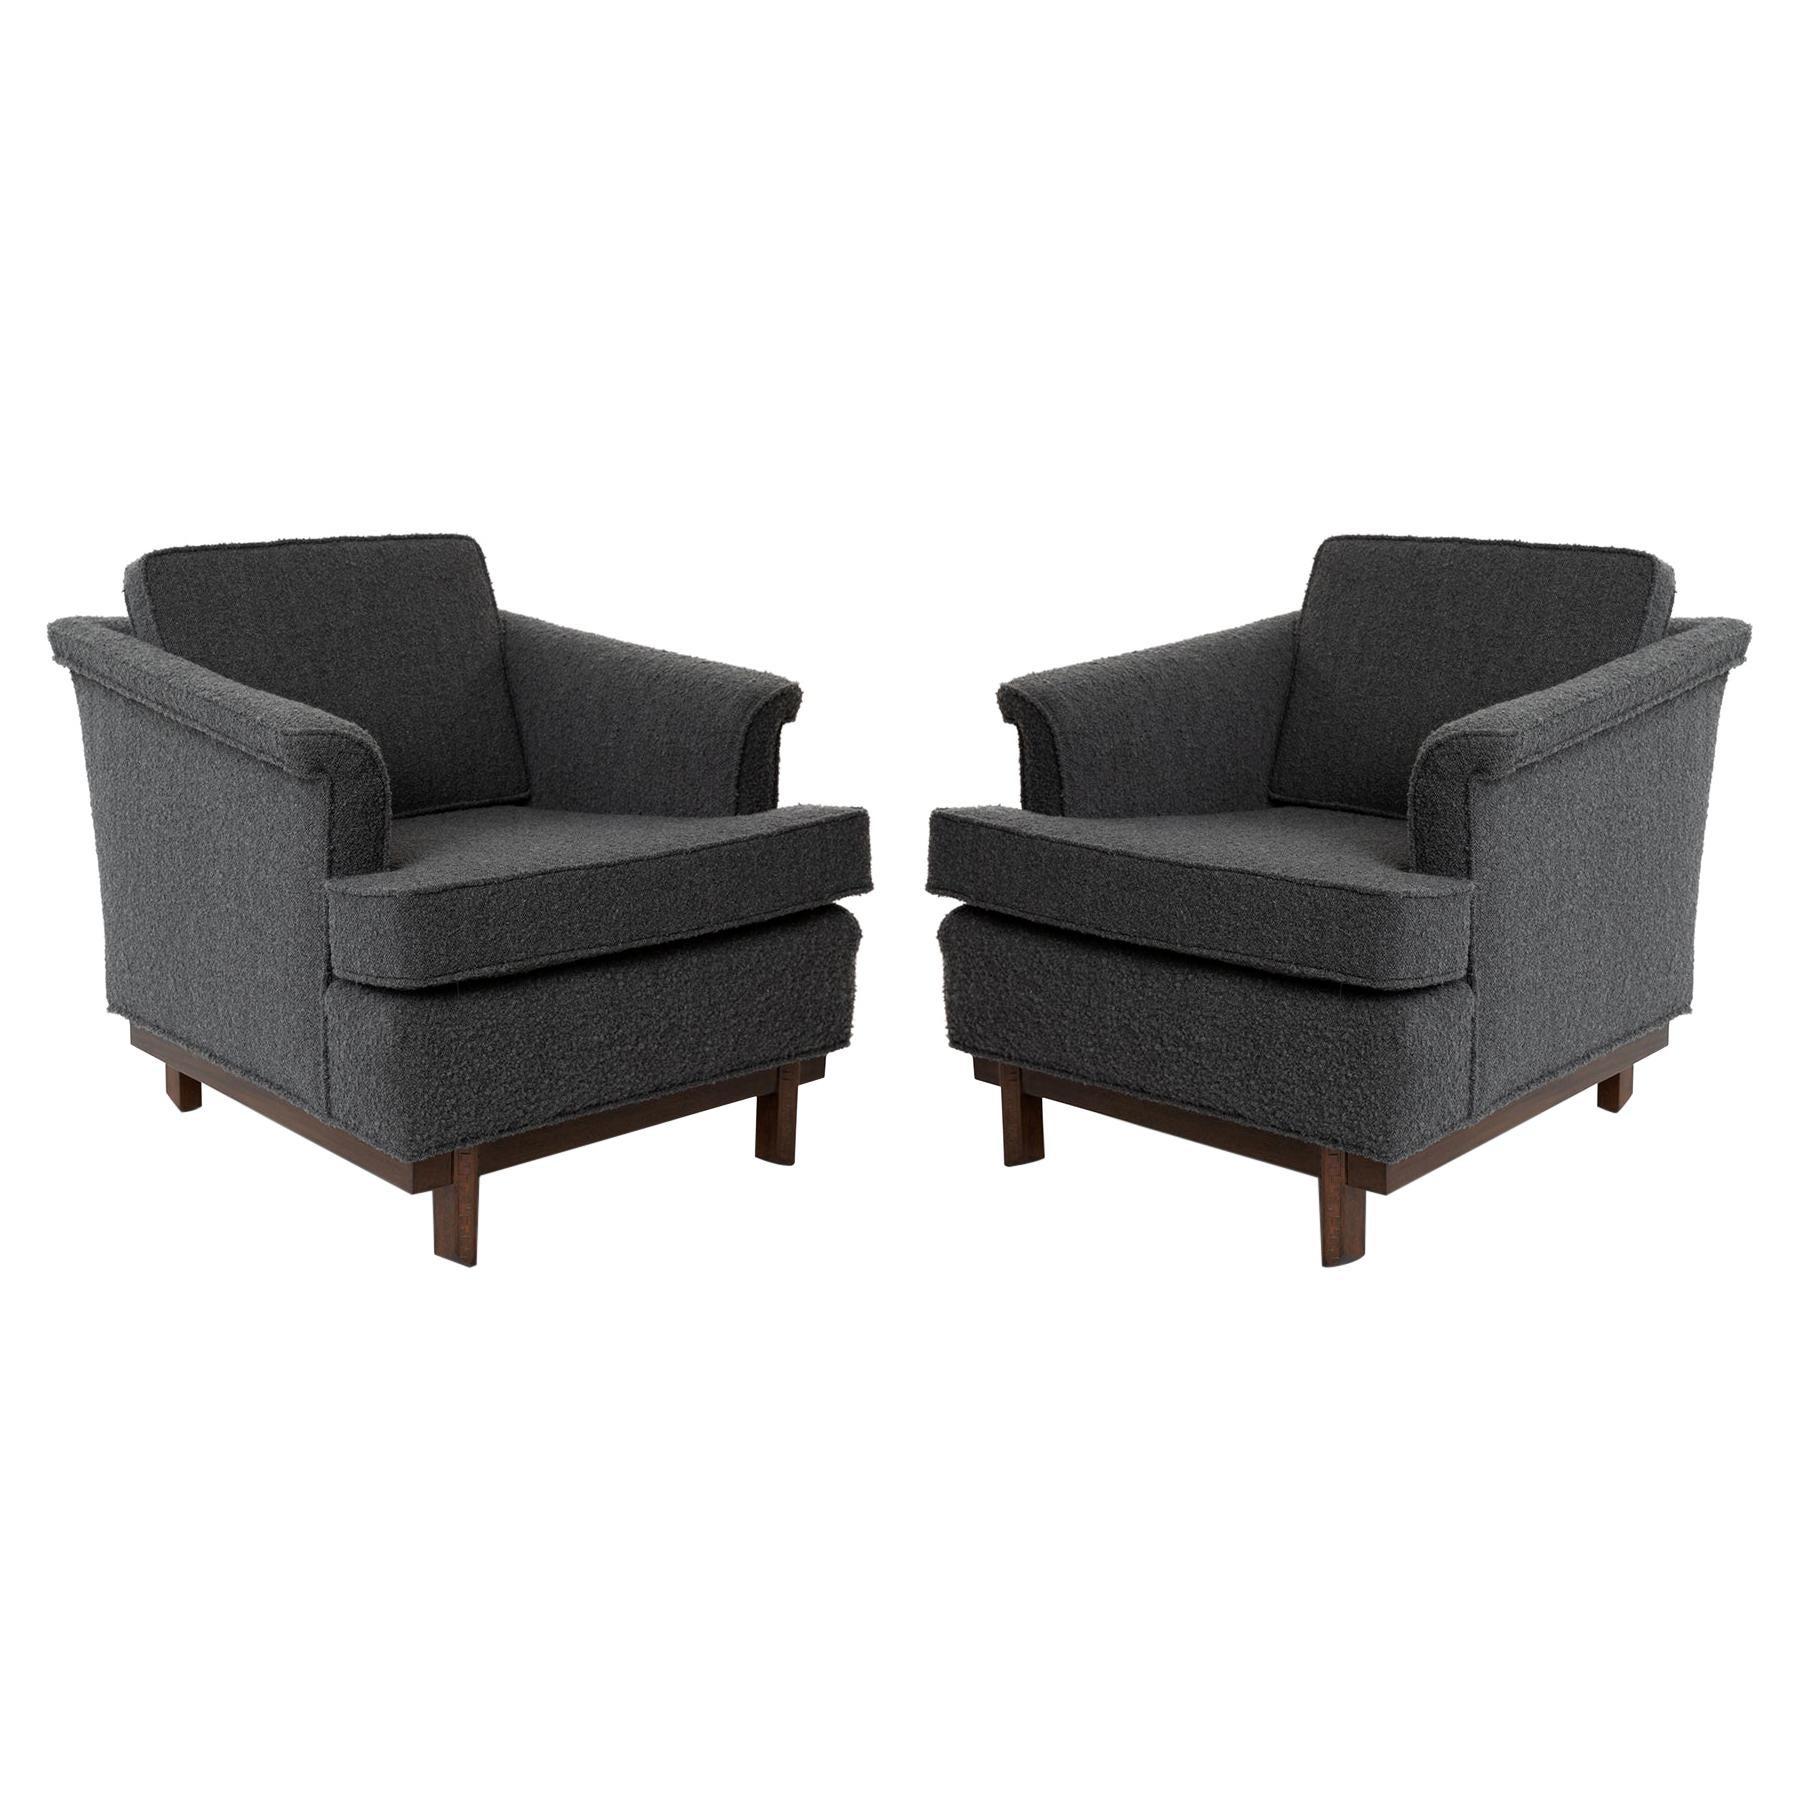 Frank Lloyd Wright Lounge Chairs